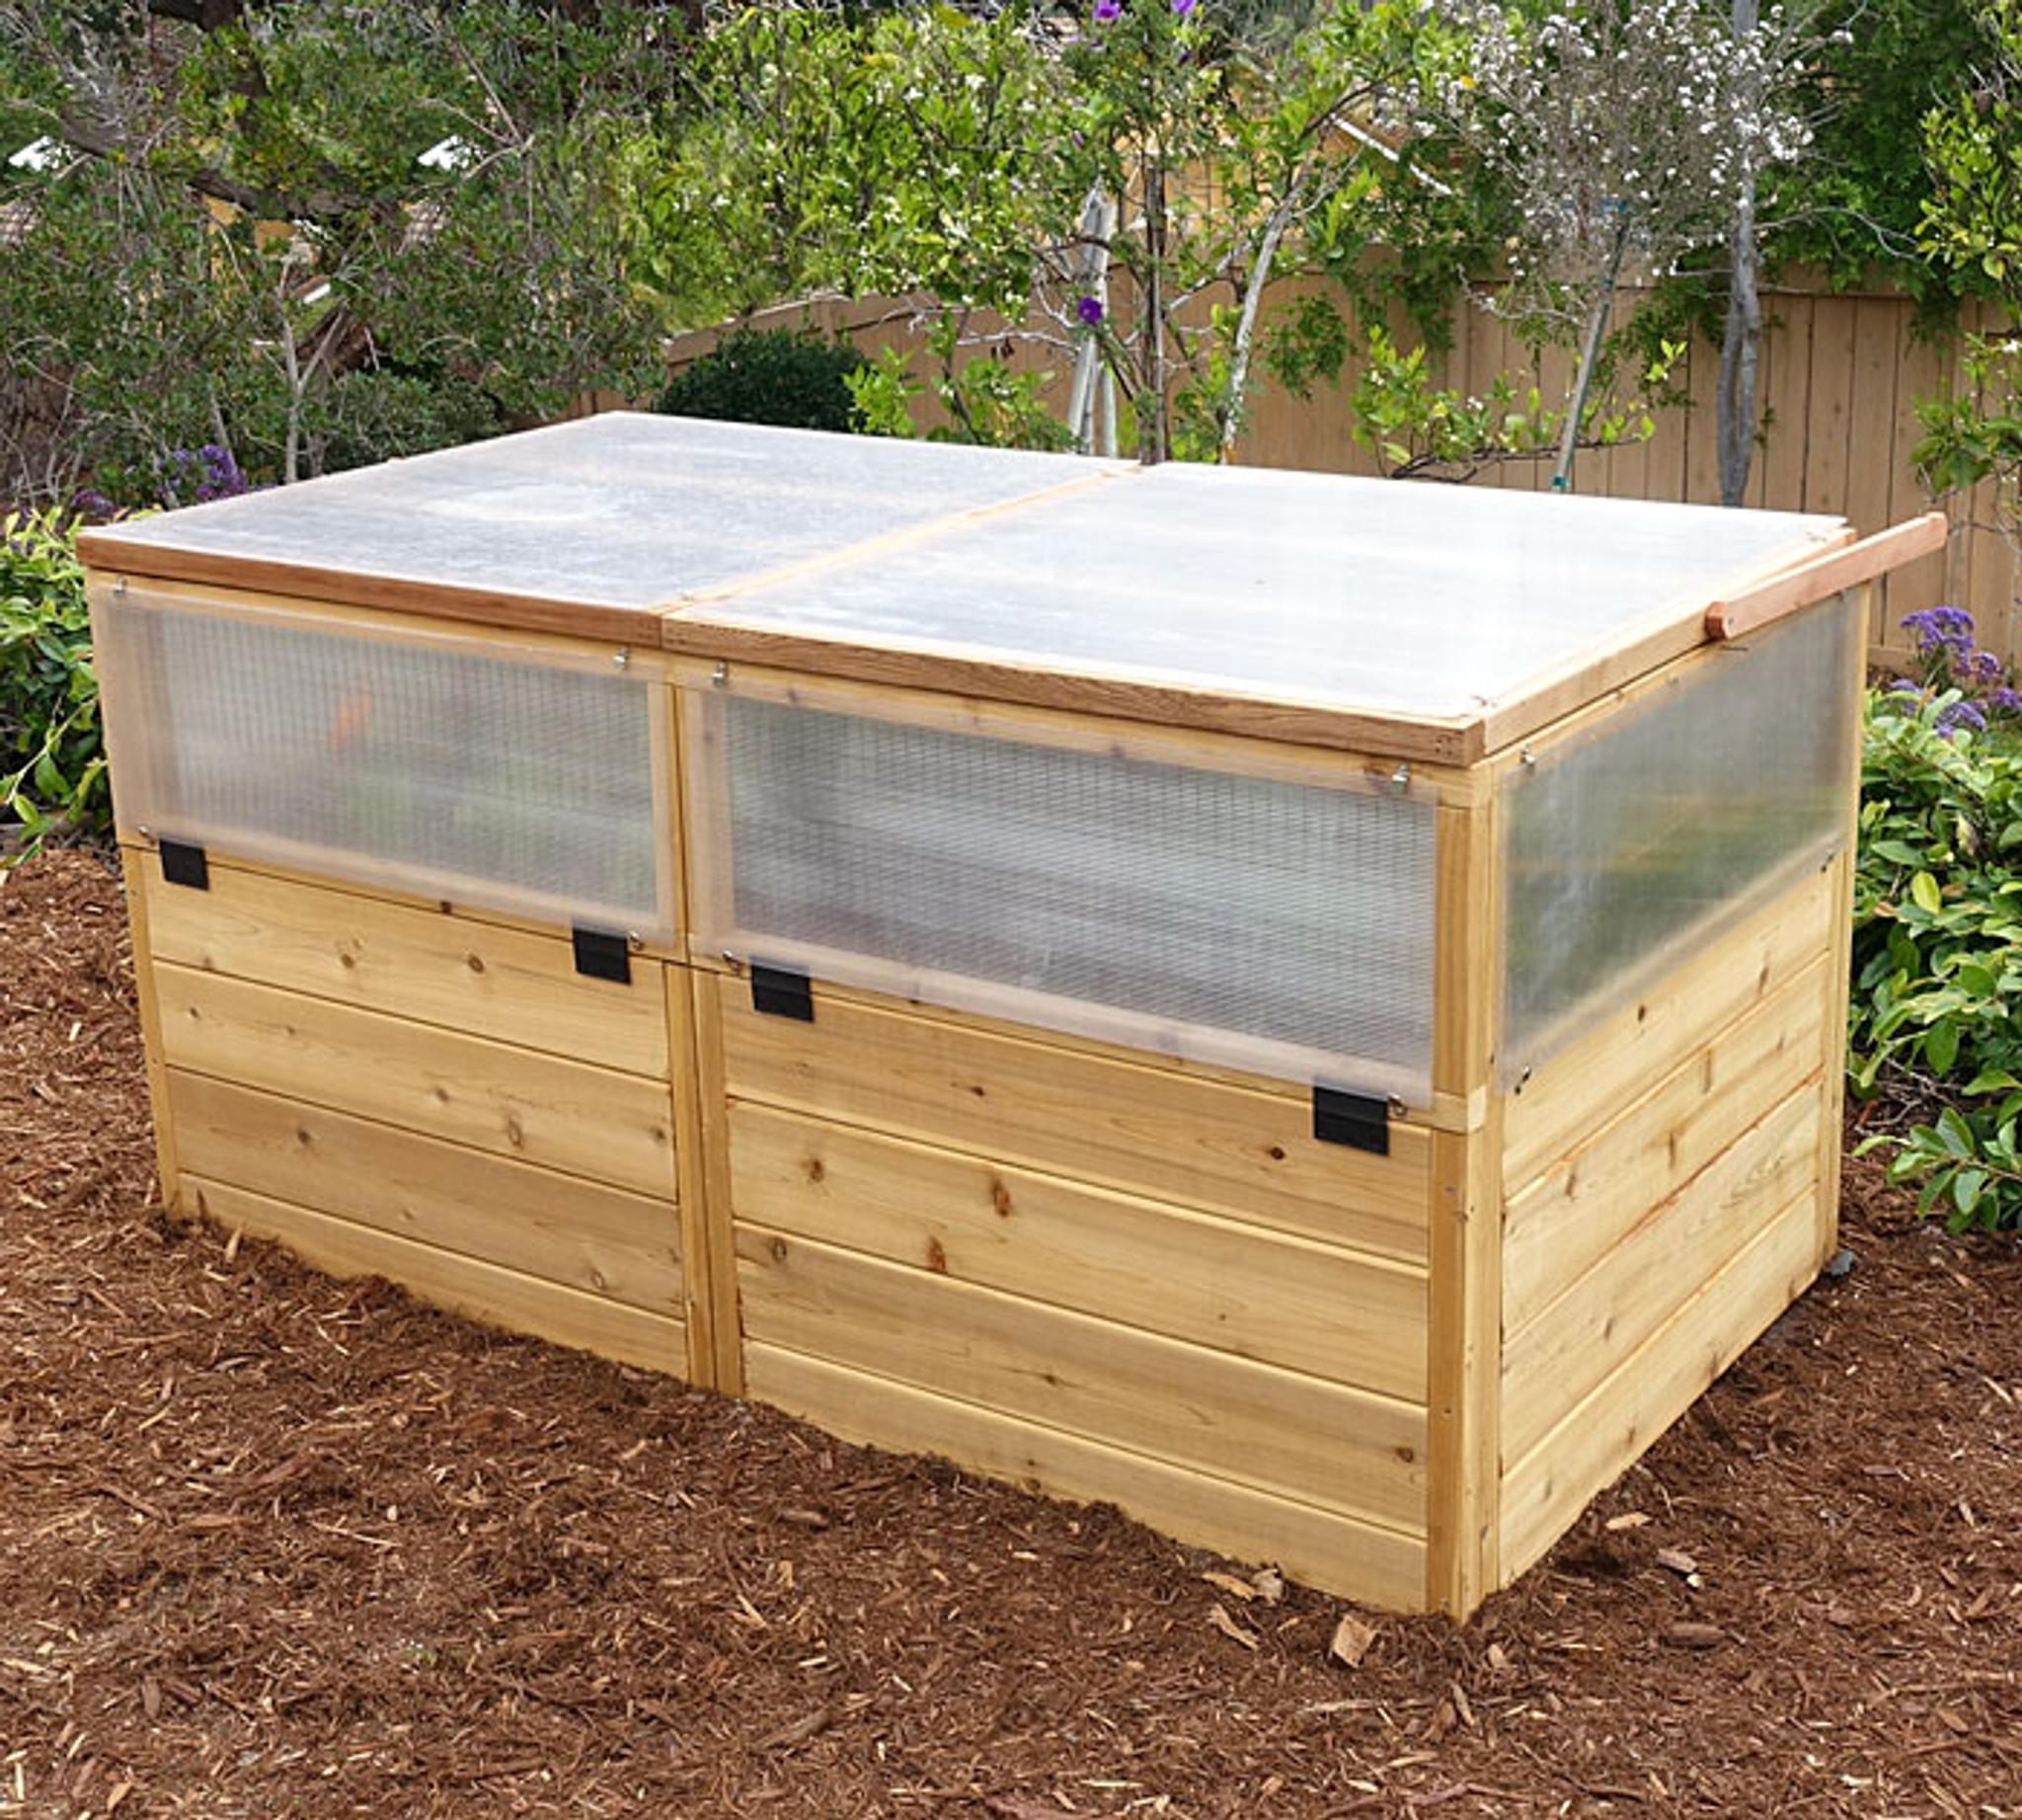 3 x 6 raised garden bed mini greenhouse kit - Raised Garden Bed Kit